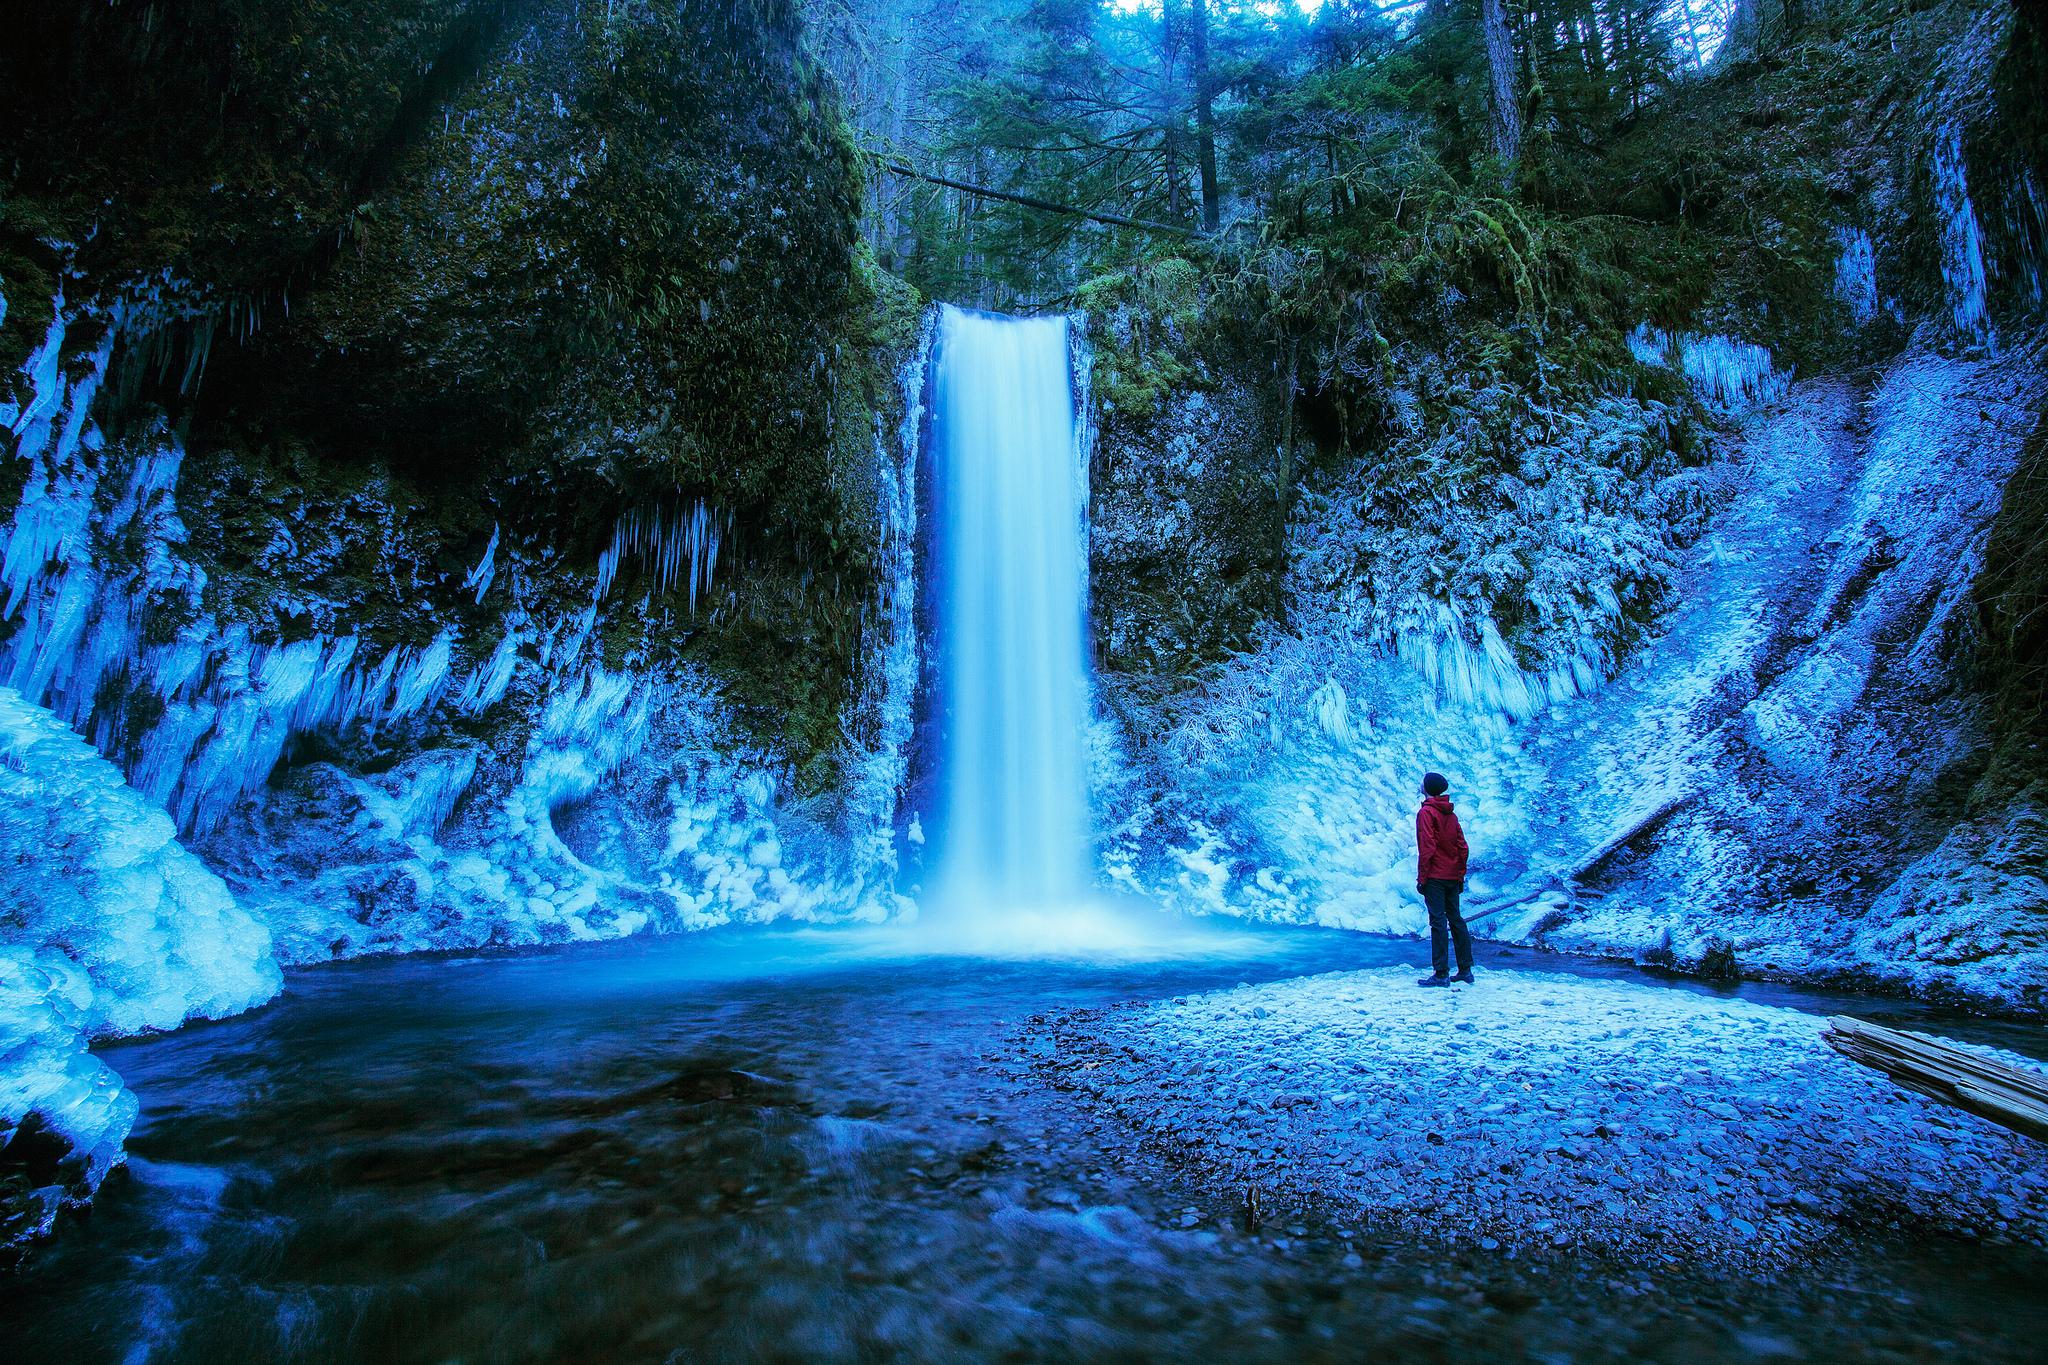 Water Winter 2048x1365